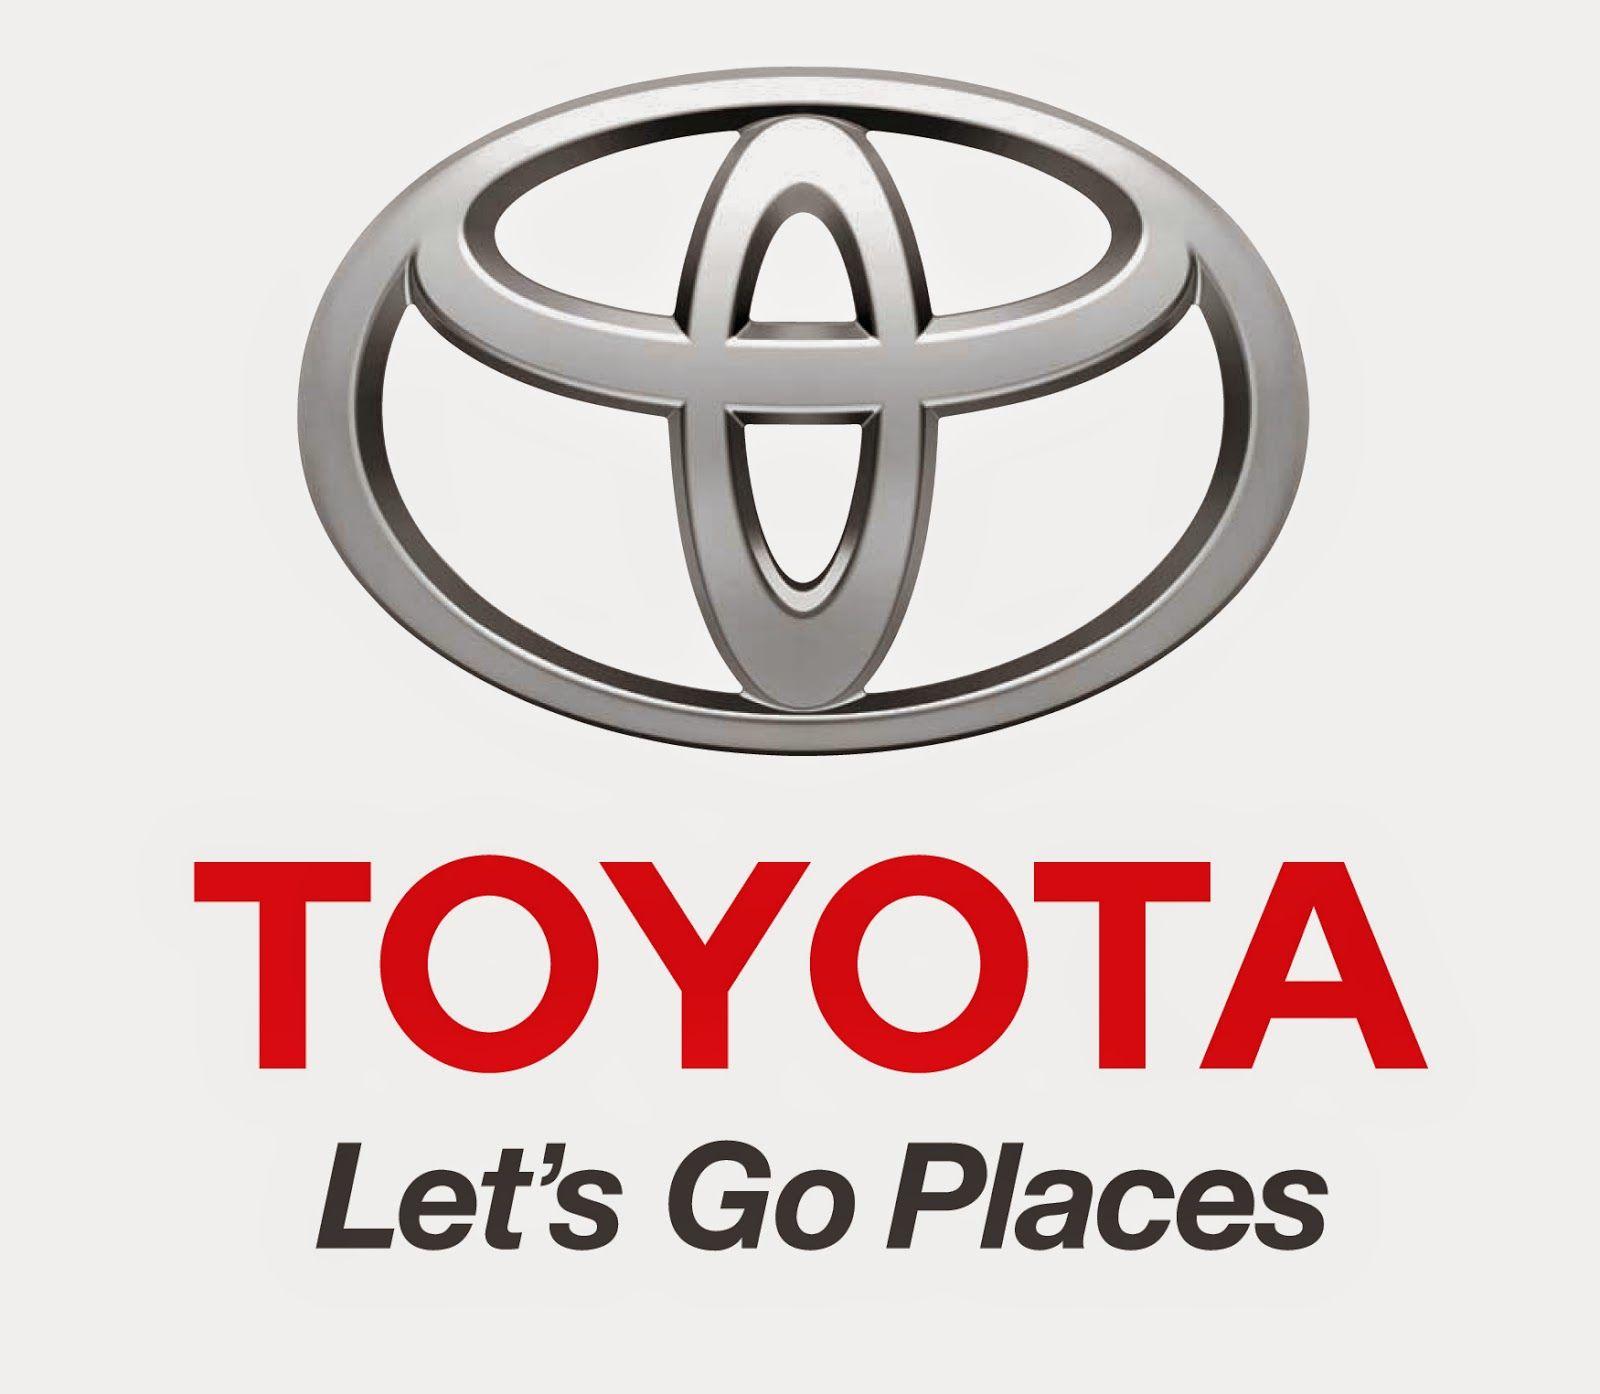 Toyota Dealers Rochester Ny >> Hoselton Toyota Your 1 Rochester Ny Toyota Dealer Toyota Logos